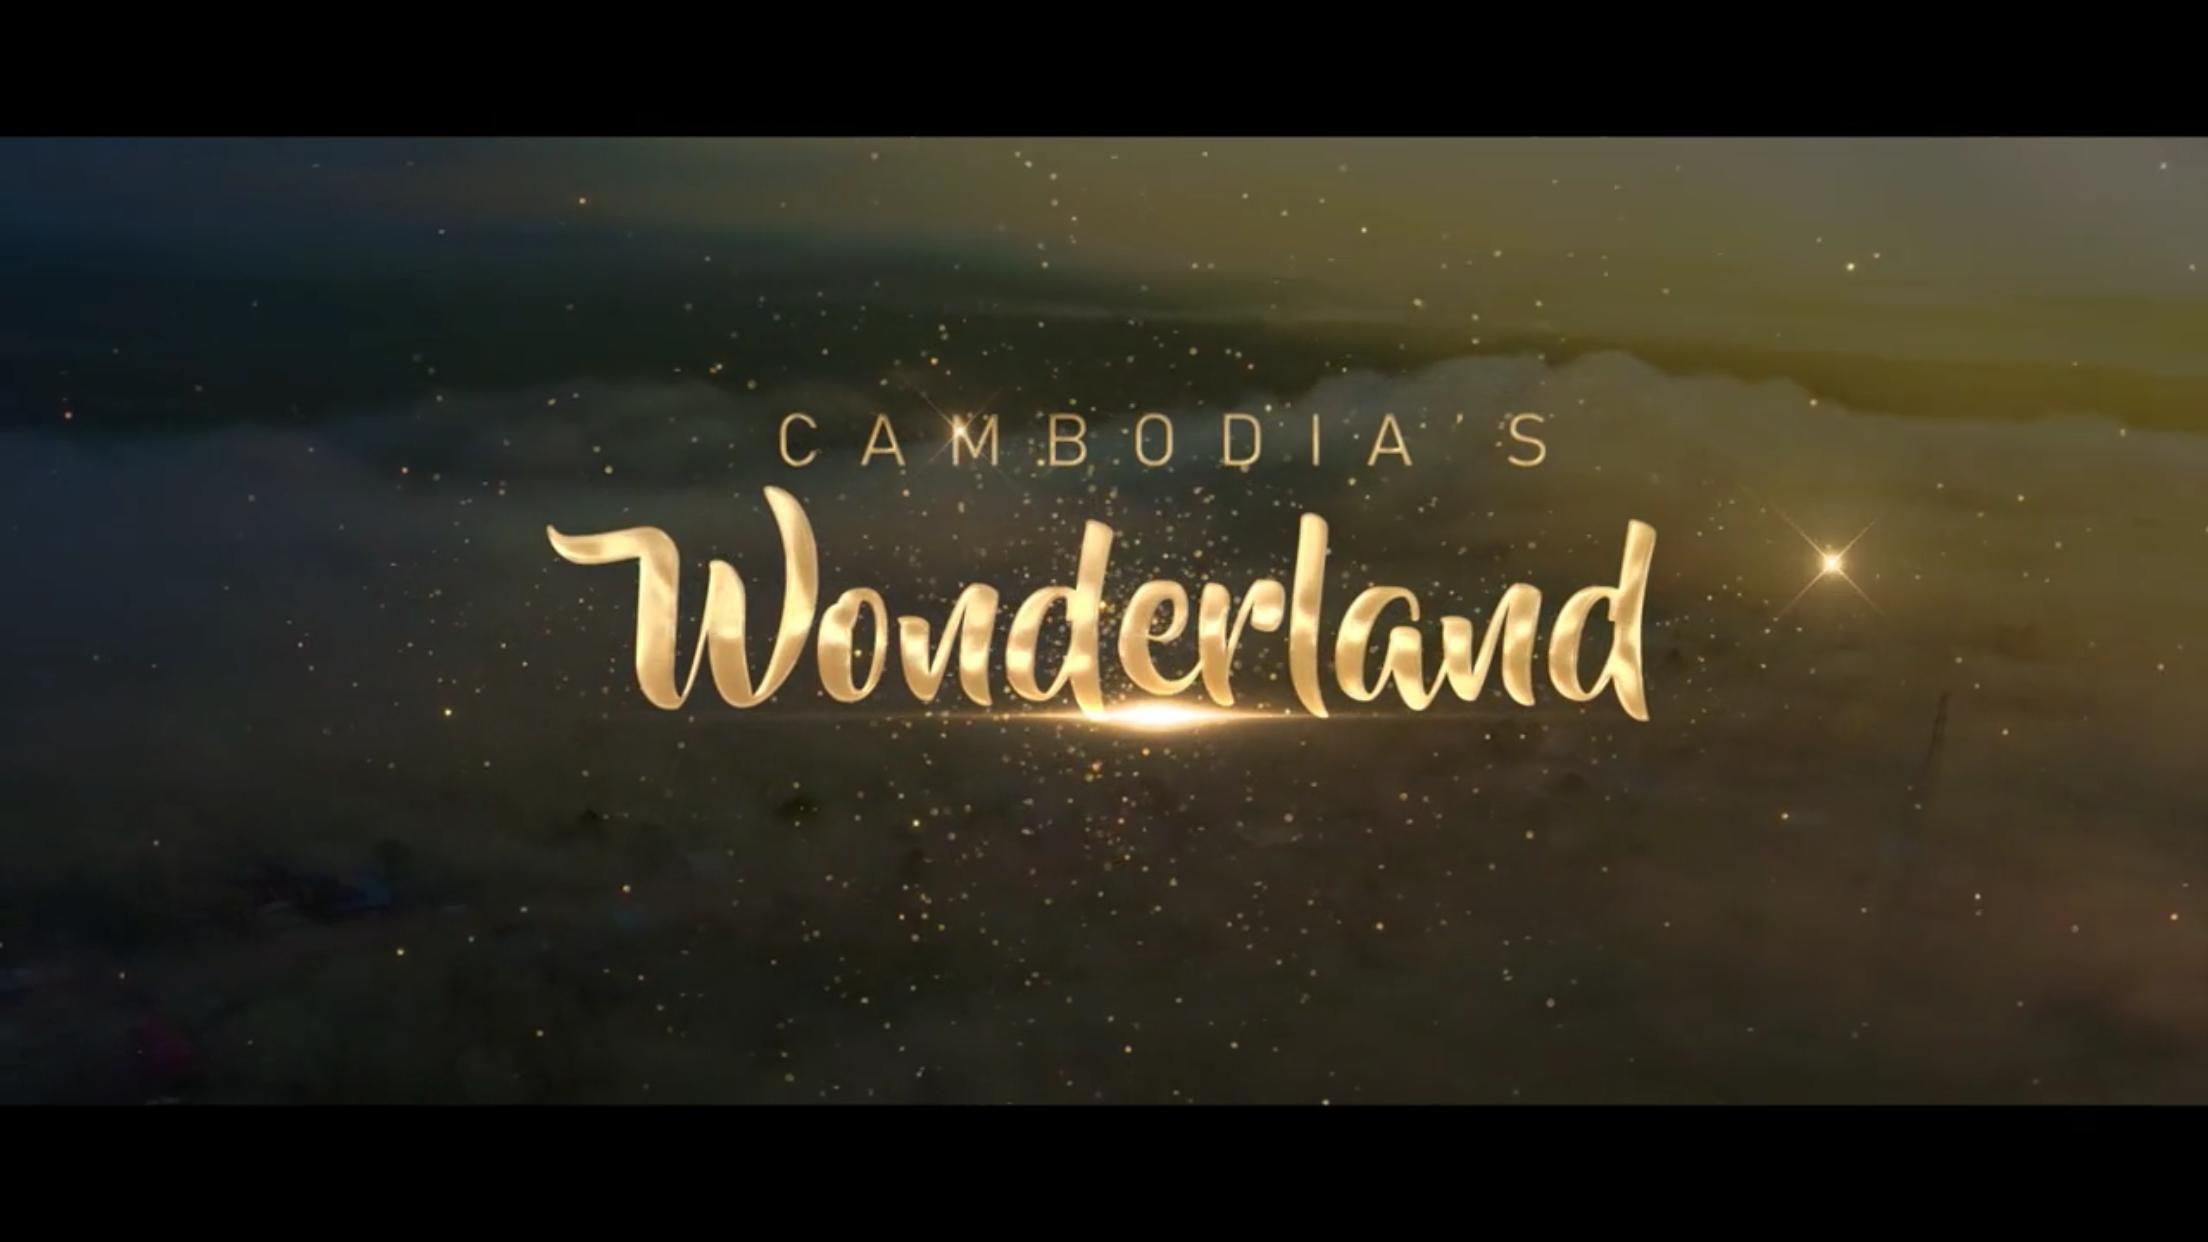 Cambodia's Wonderland 00990